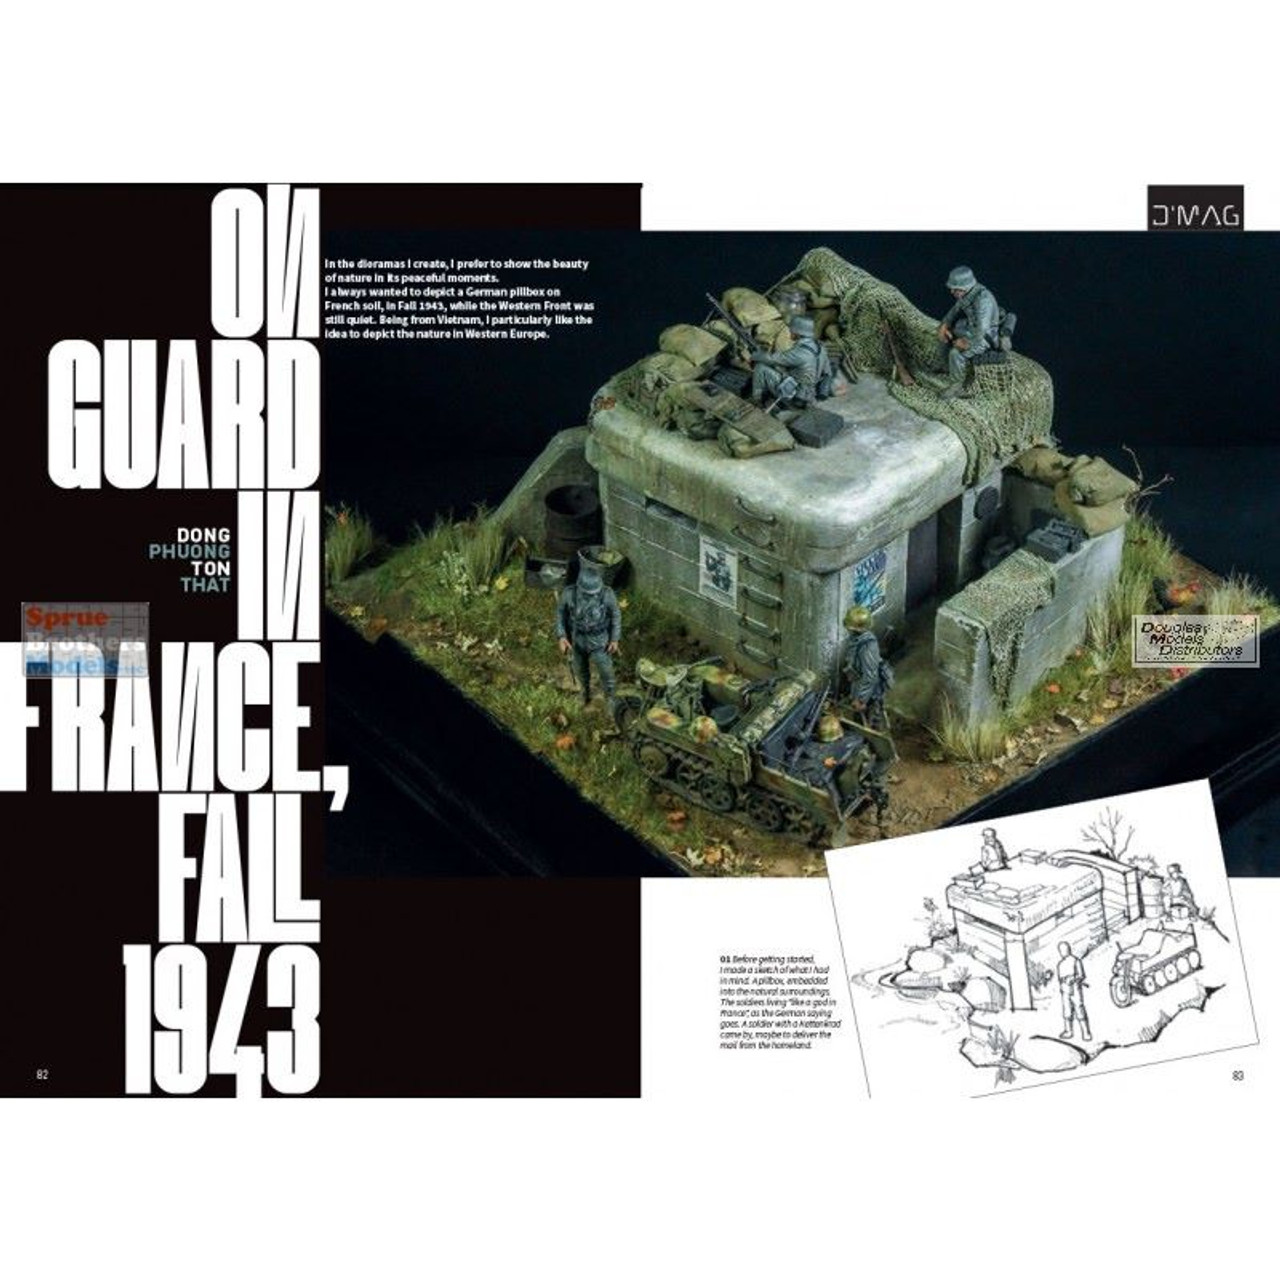 PLEDM007 PLA Editions - Dioramag Volume 8